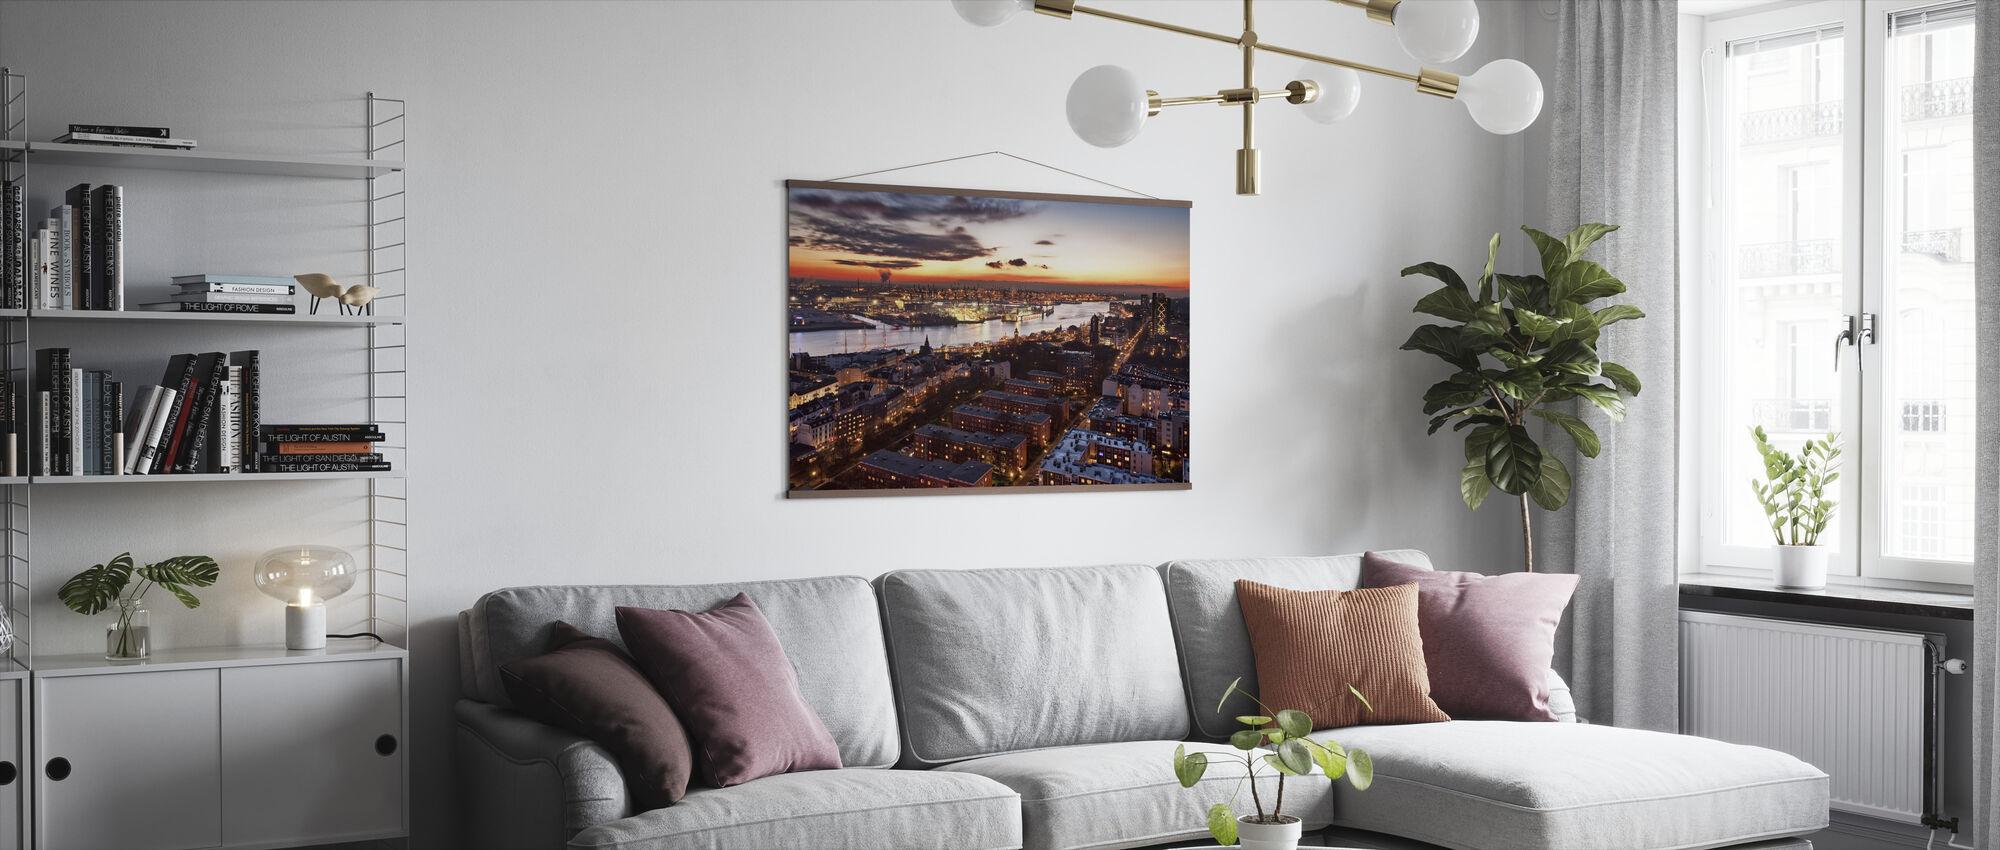 Wintersunset - Poster - Living Room